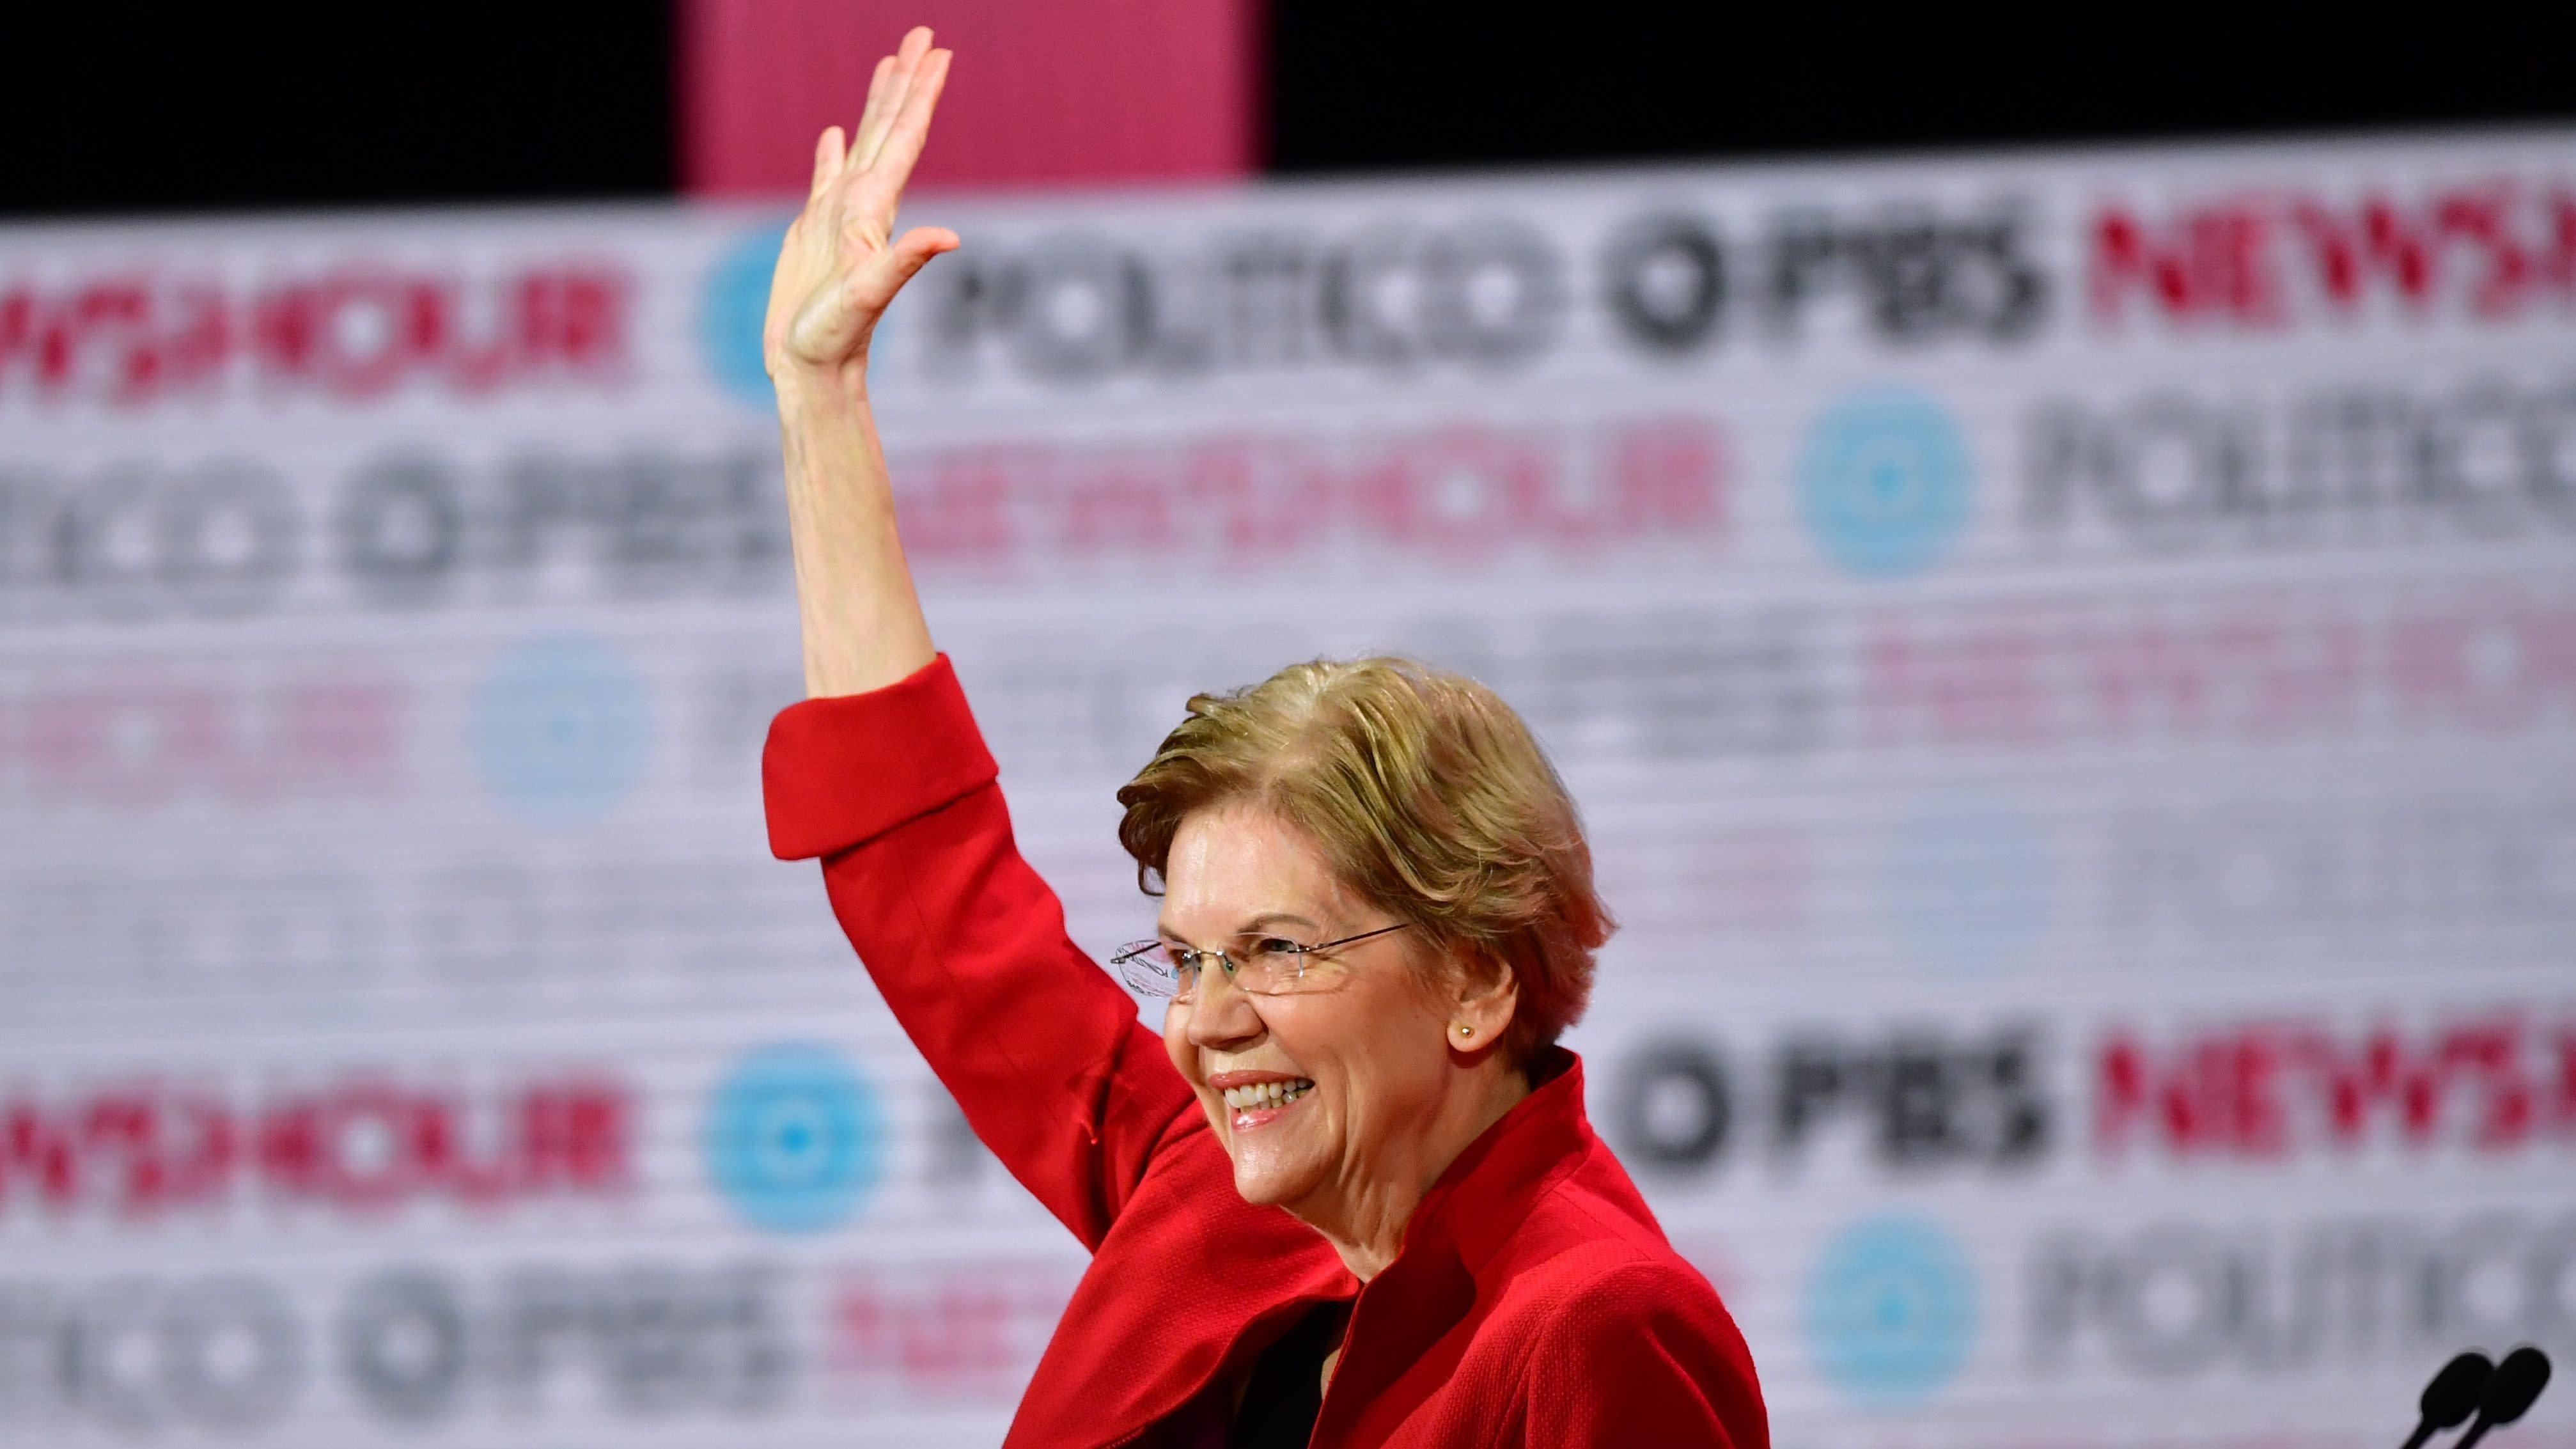 Elizabeth Warren's $10 Trillion Green New Deal Could Change America Forever